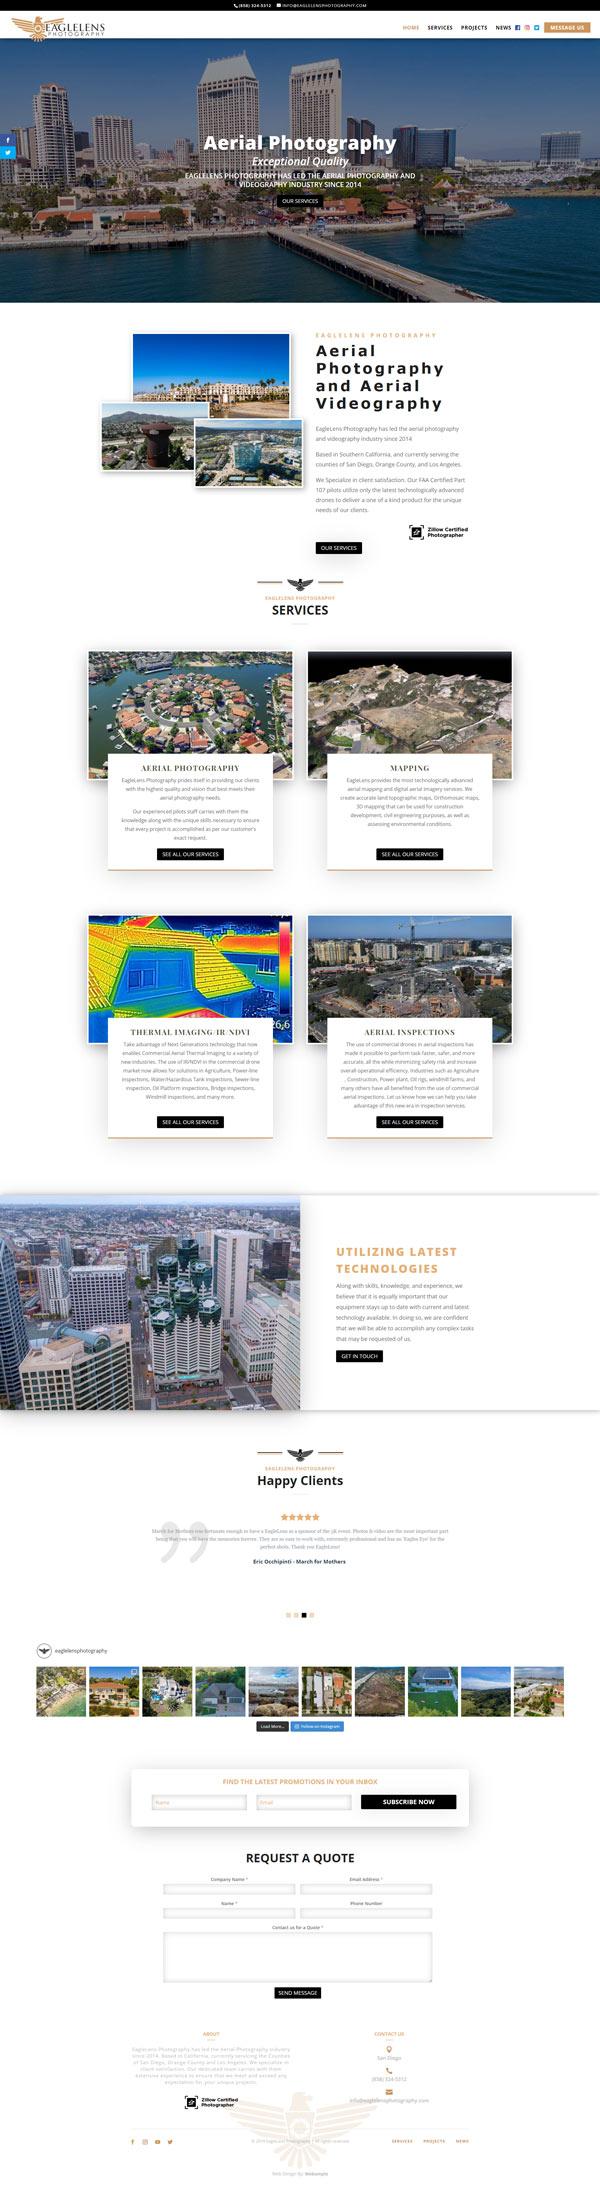 Eagle Lens Photography & Spa Web Design Home Page